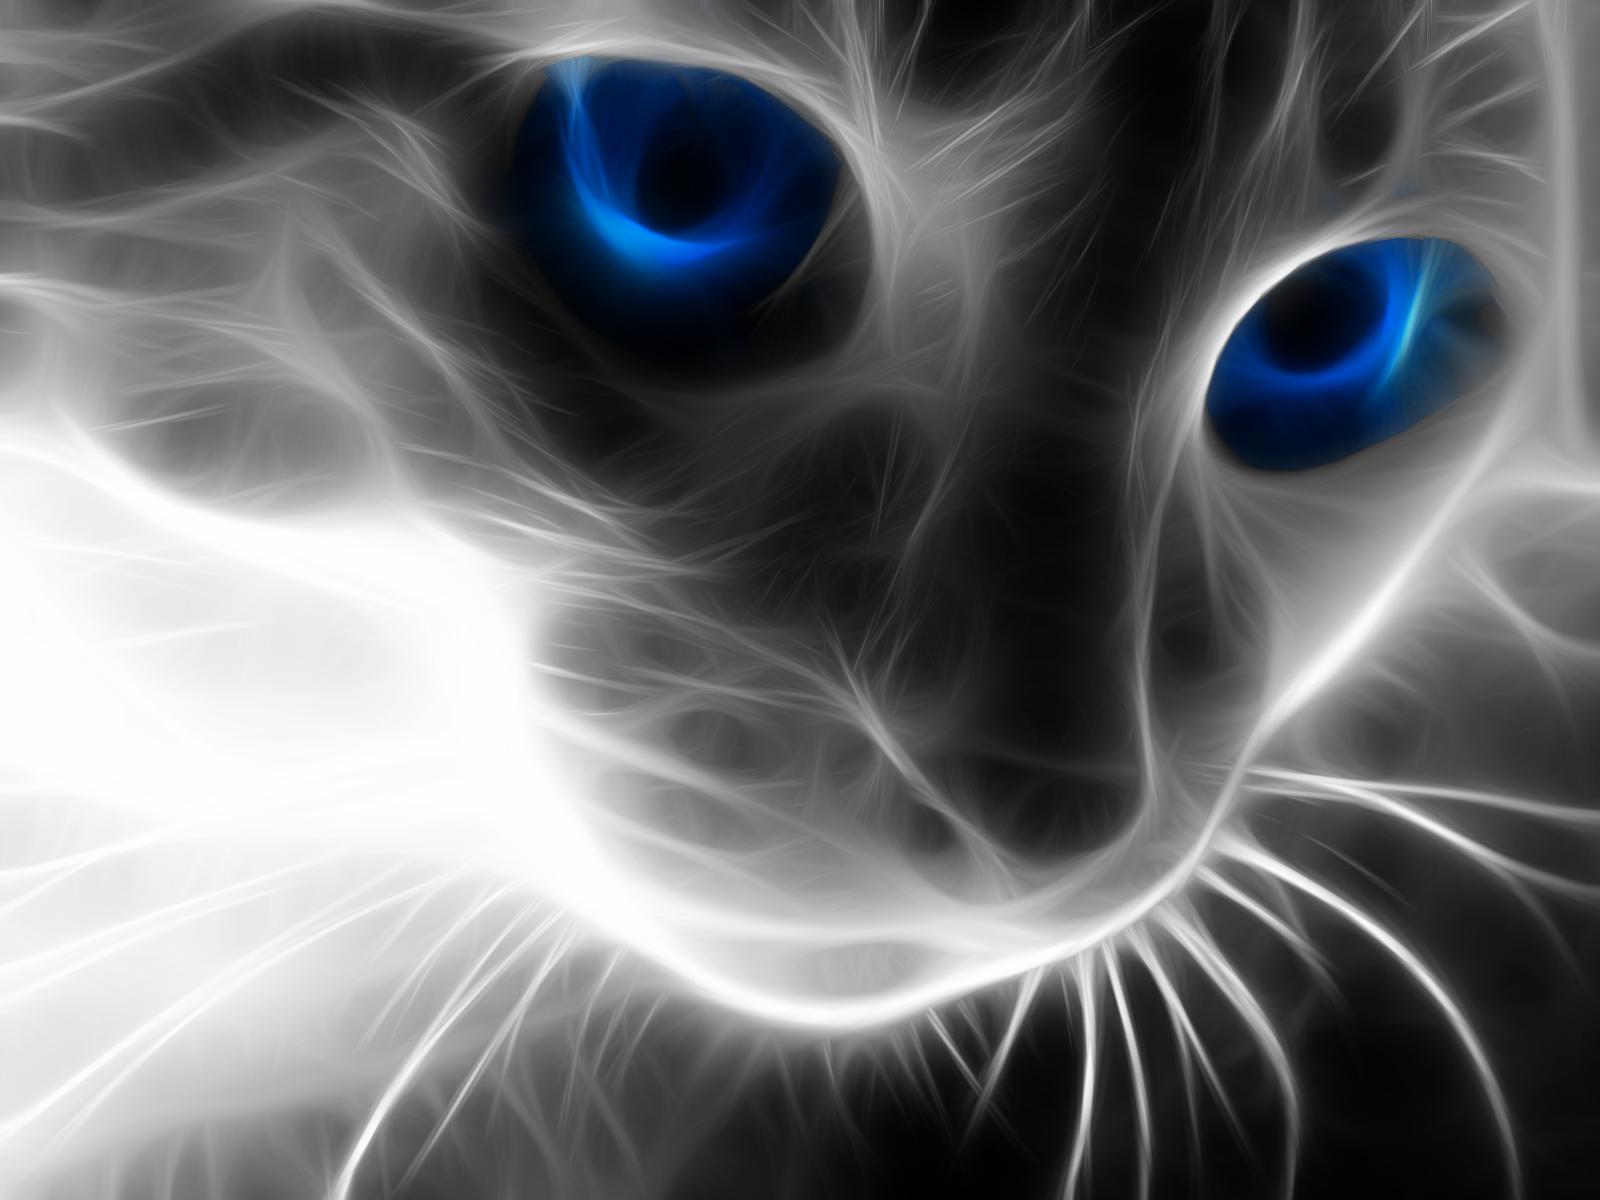 Cool Wallpapers Cool Cat 1600x1200 Download Hd Wallpaper Wallpapertip